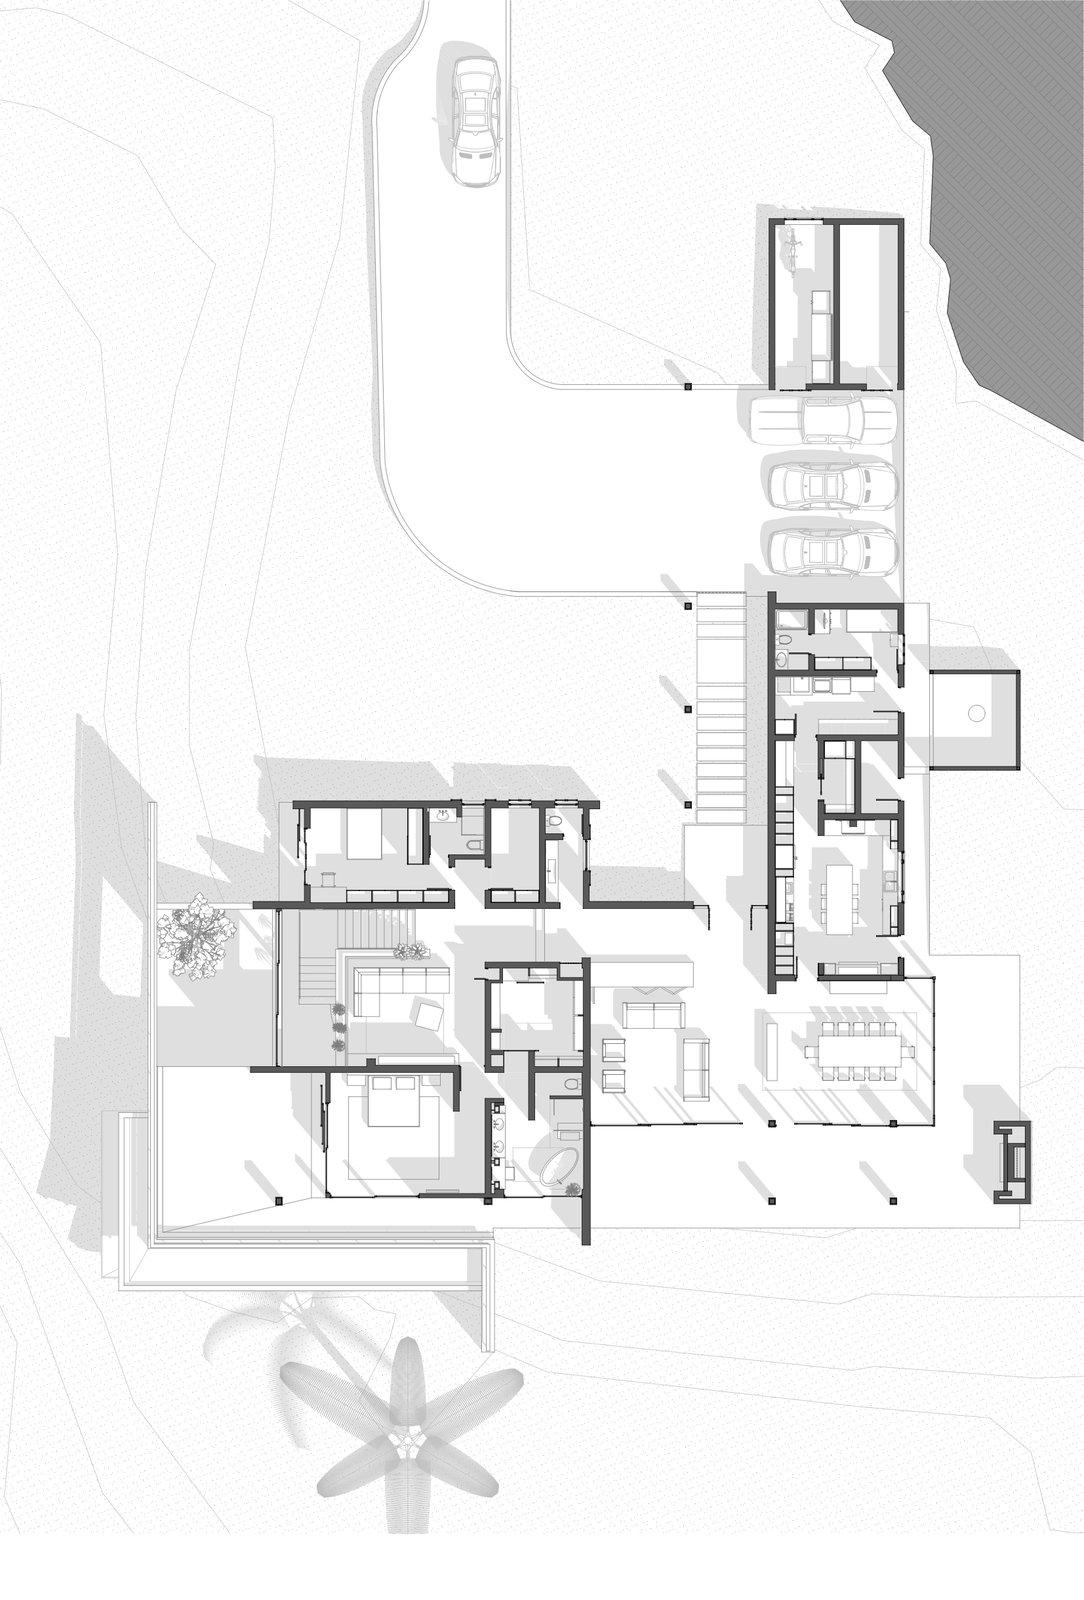 VJ House by JAG Studio